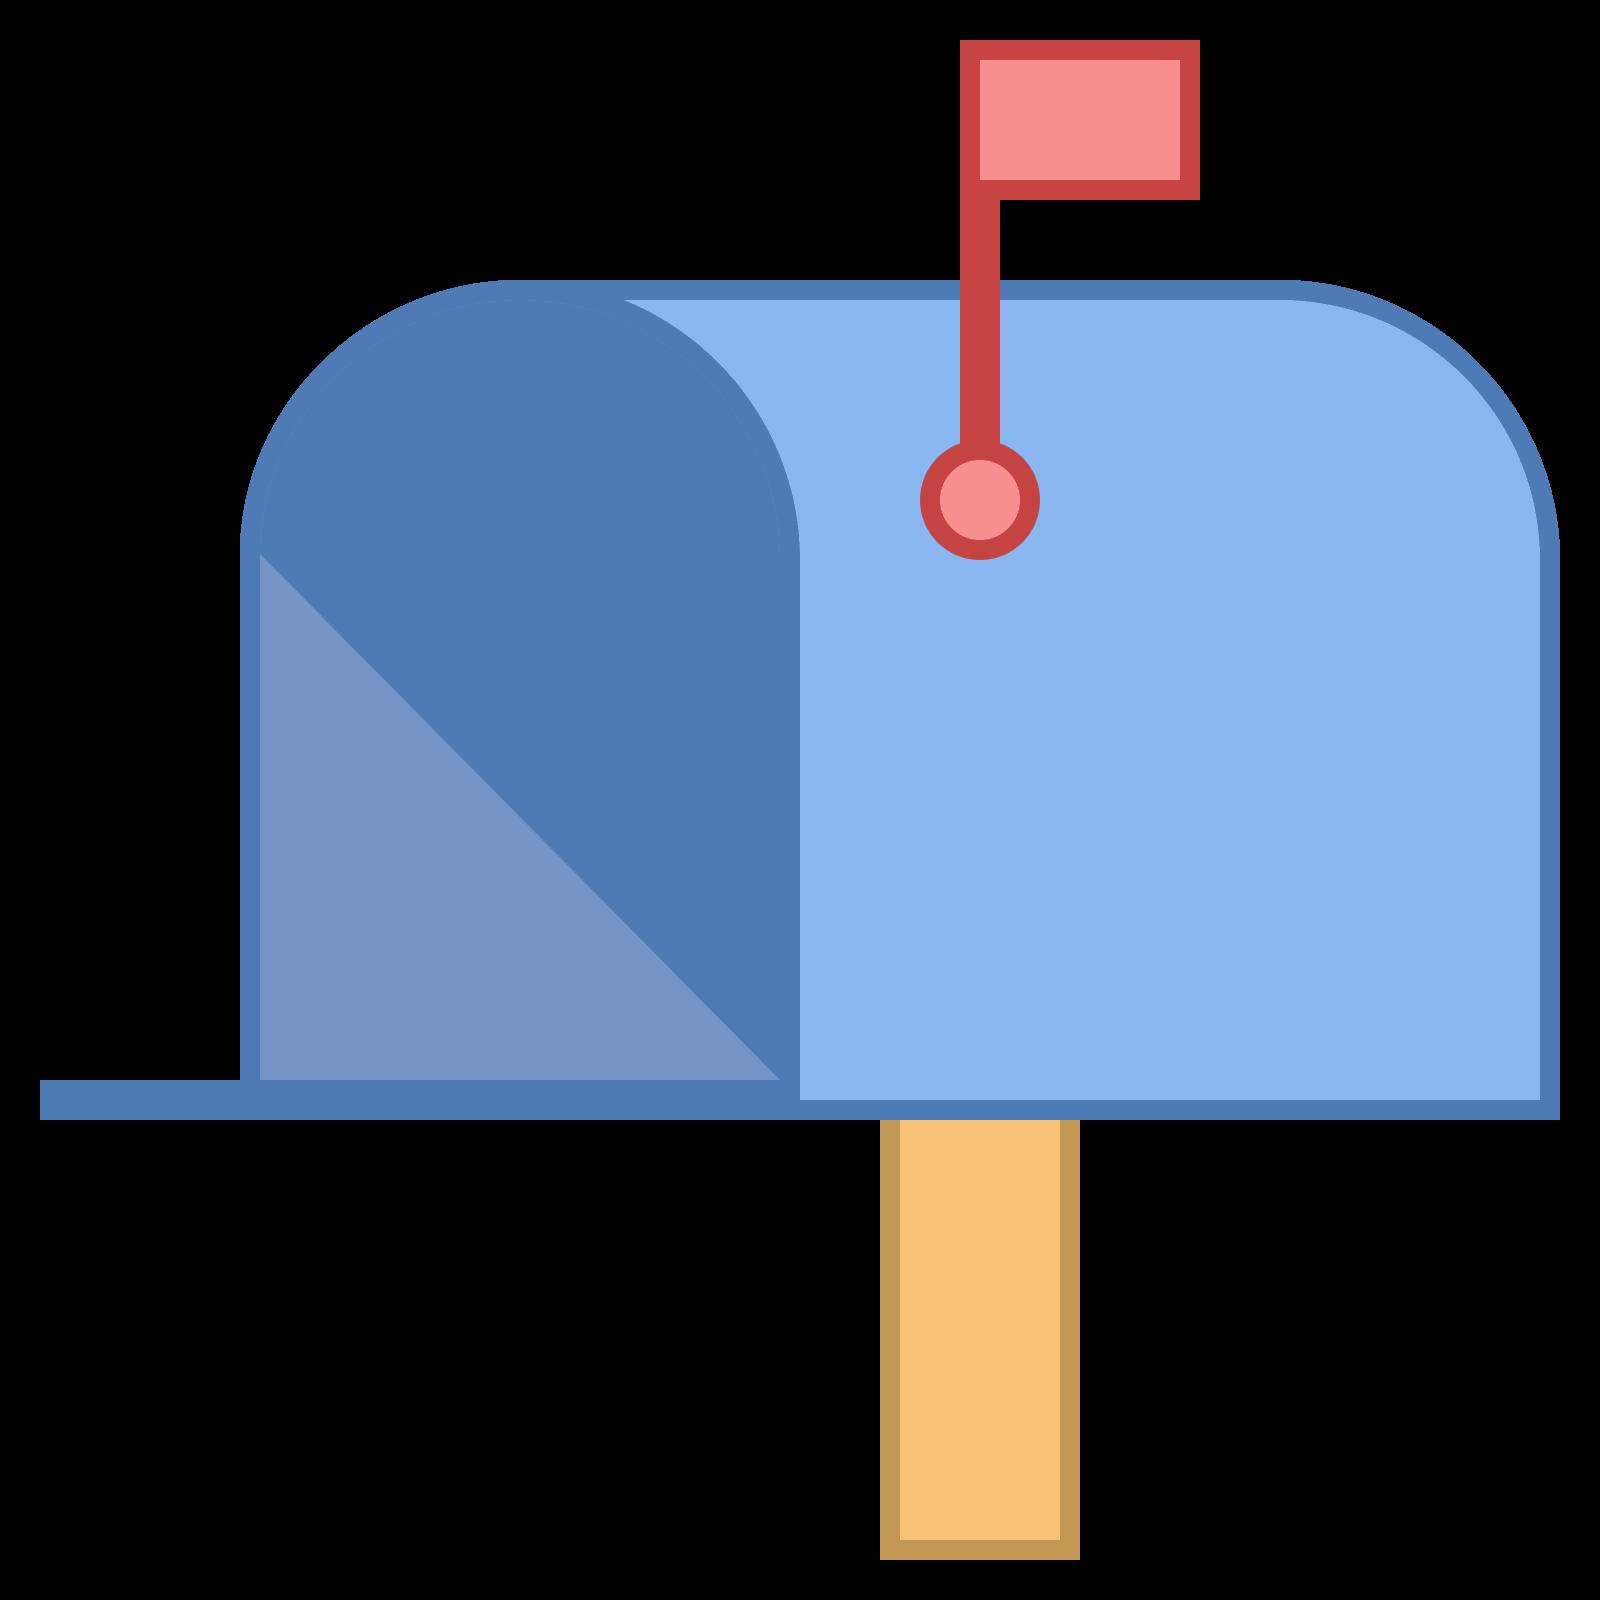 icon kostenloser download. Mailbox clipart up flag